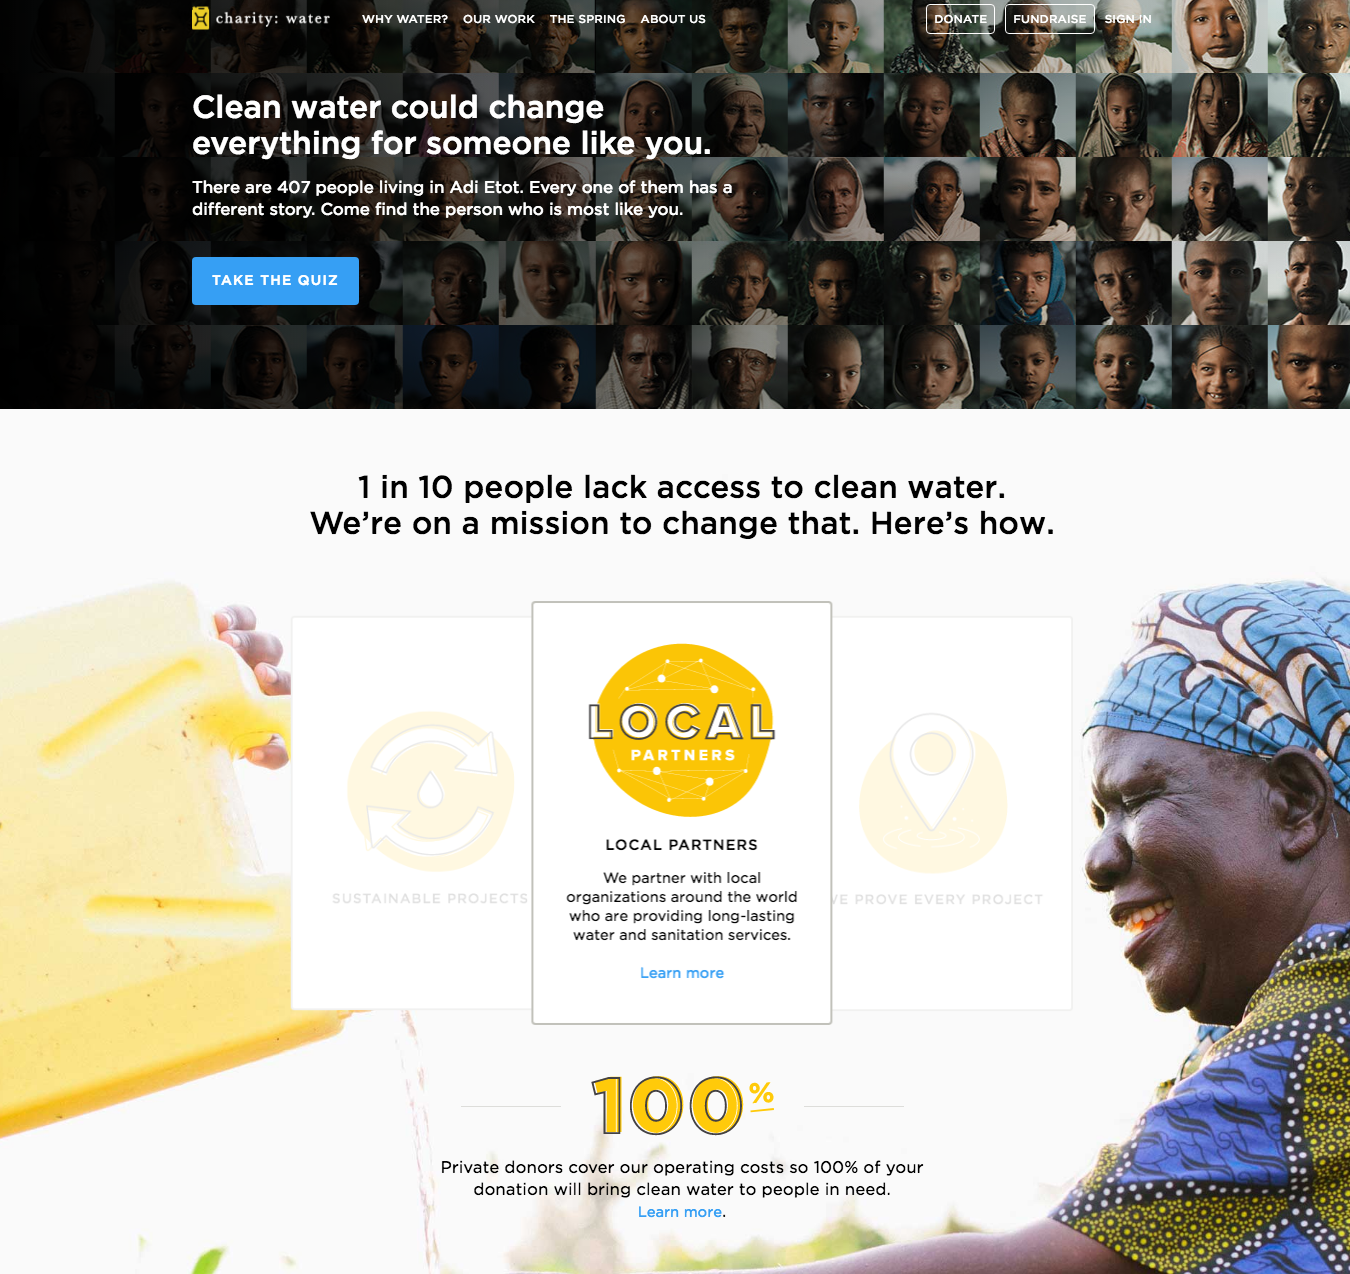 charity: water homepage web design